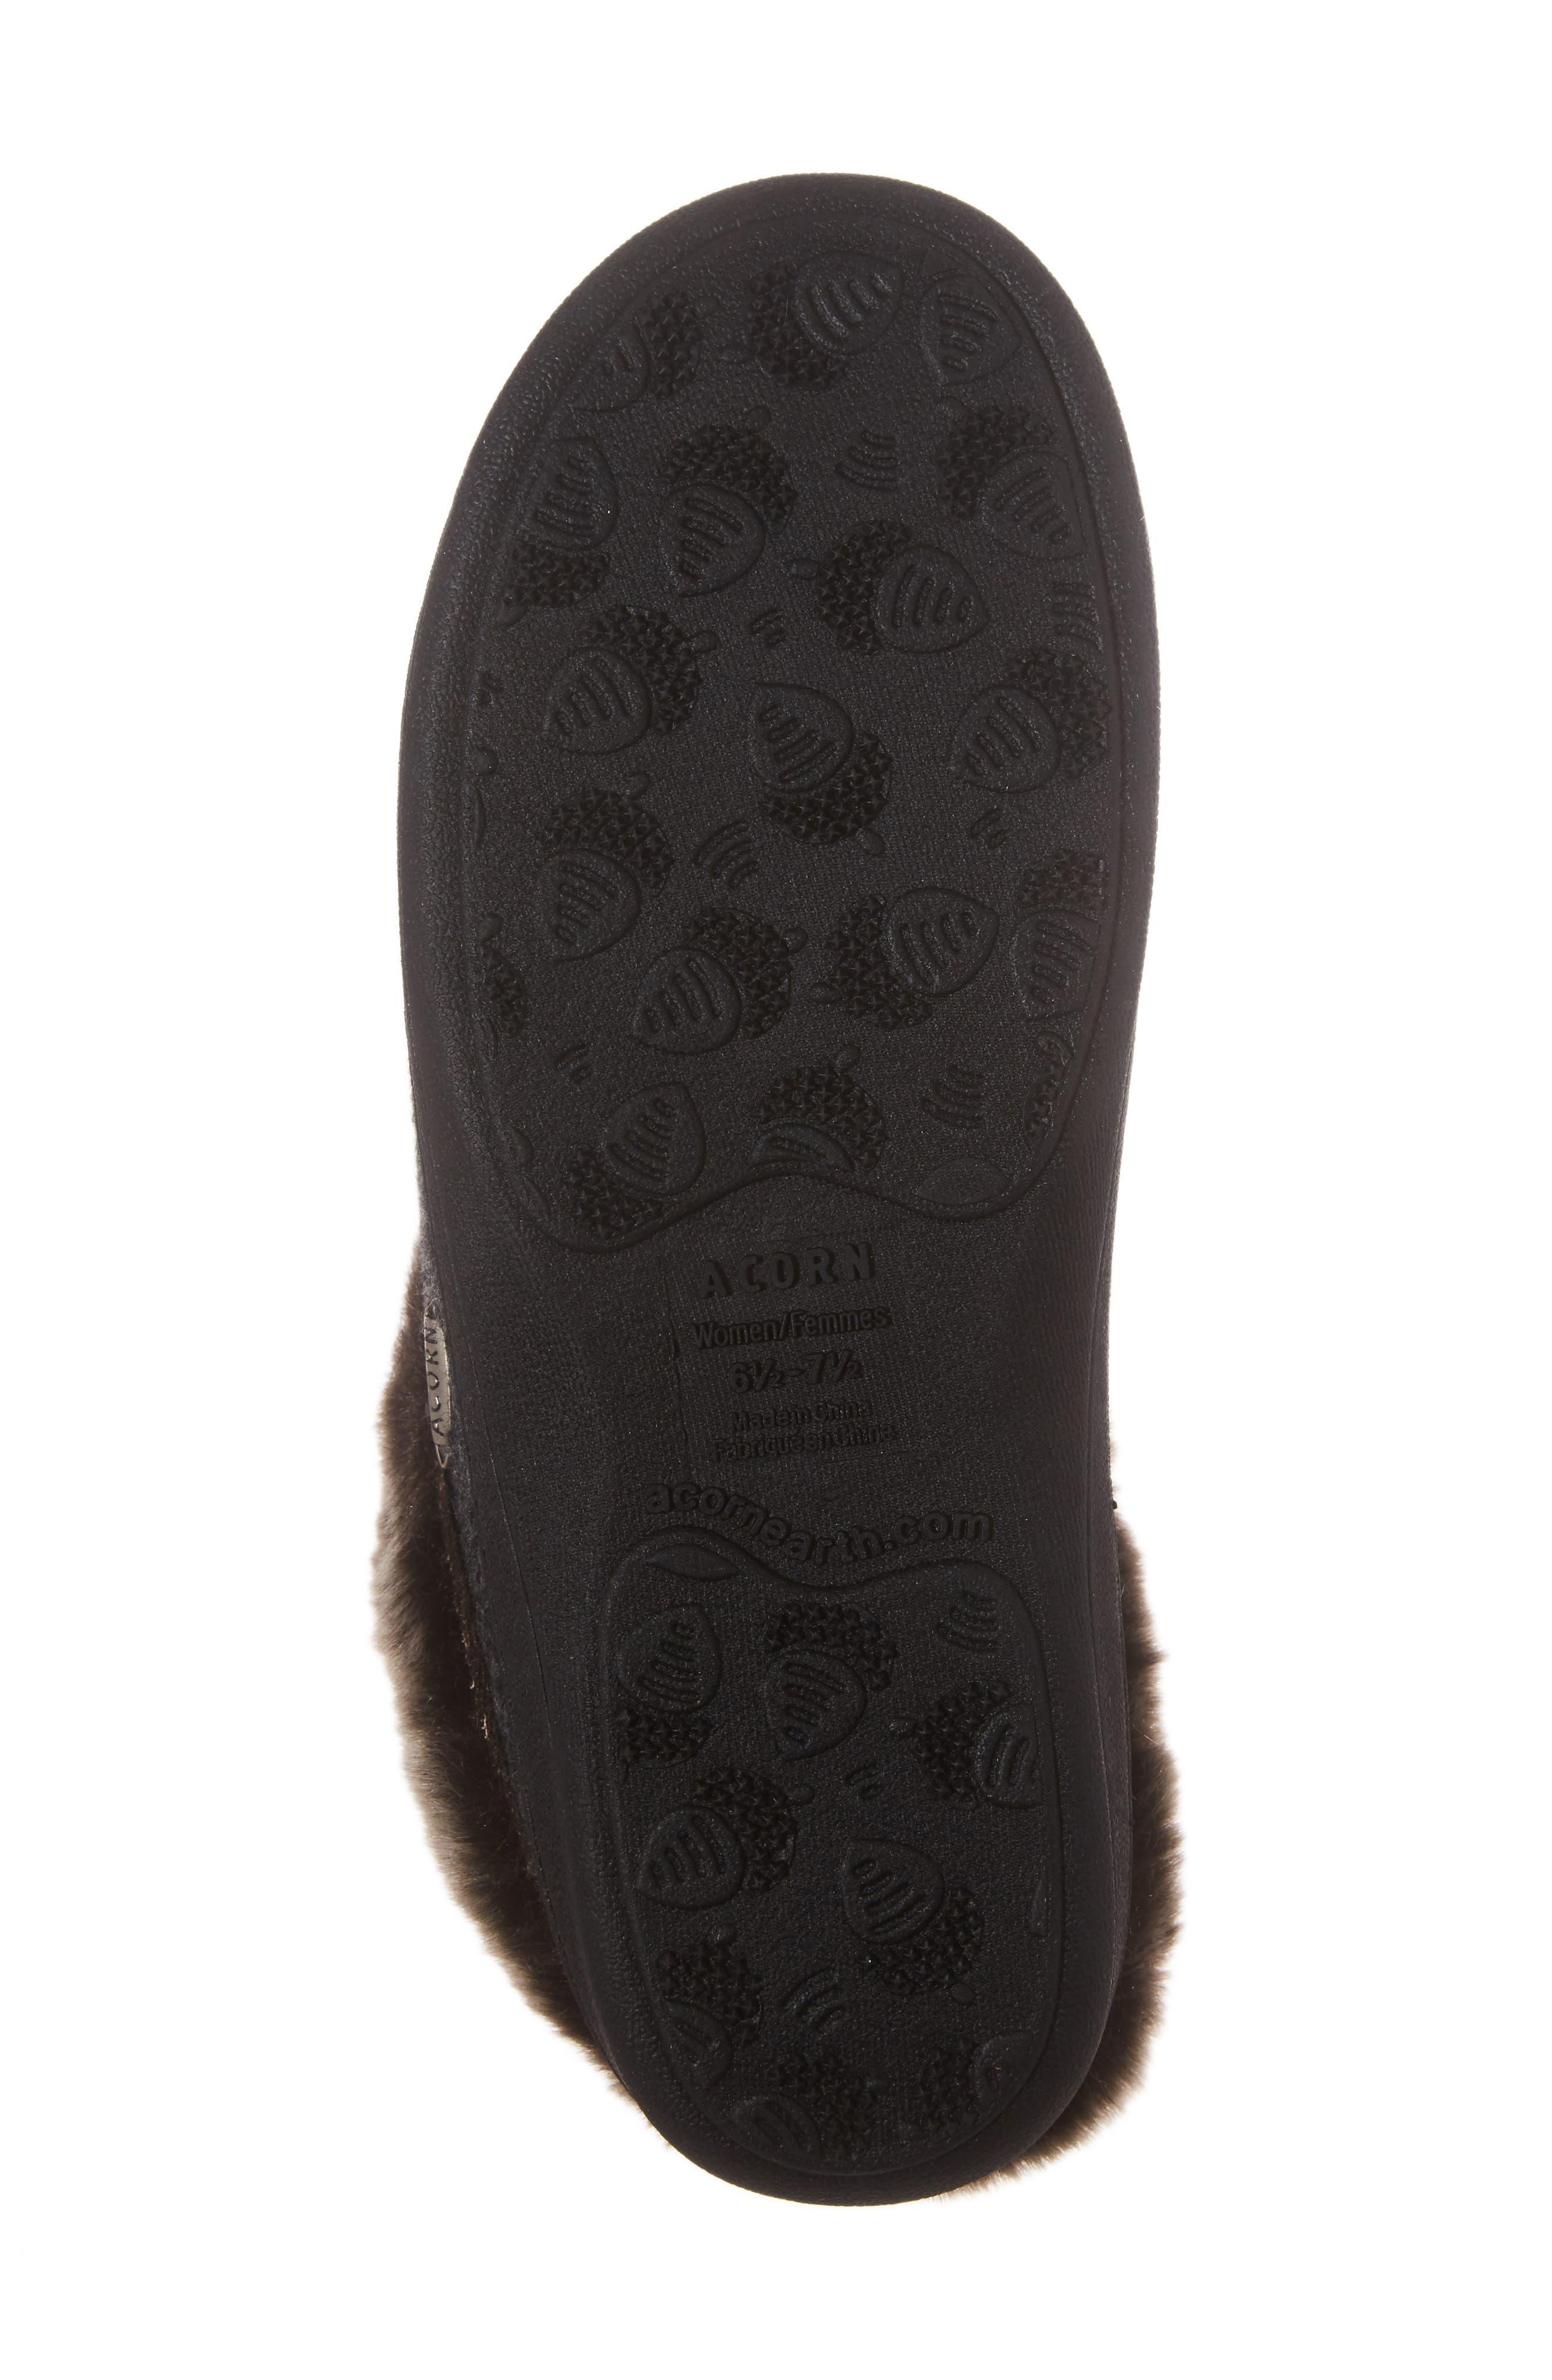 Chinchilla Faux Fur Slipper,                             Alternate thumbnail 6, color,                             Dark Charcoal Heather